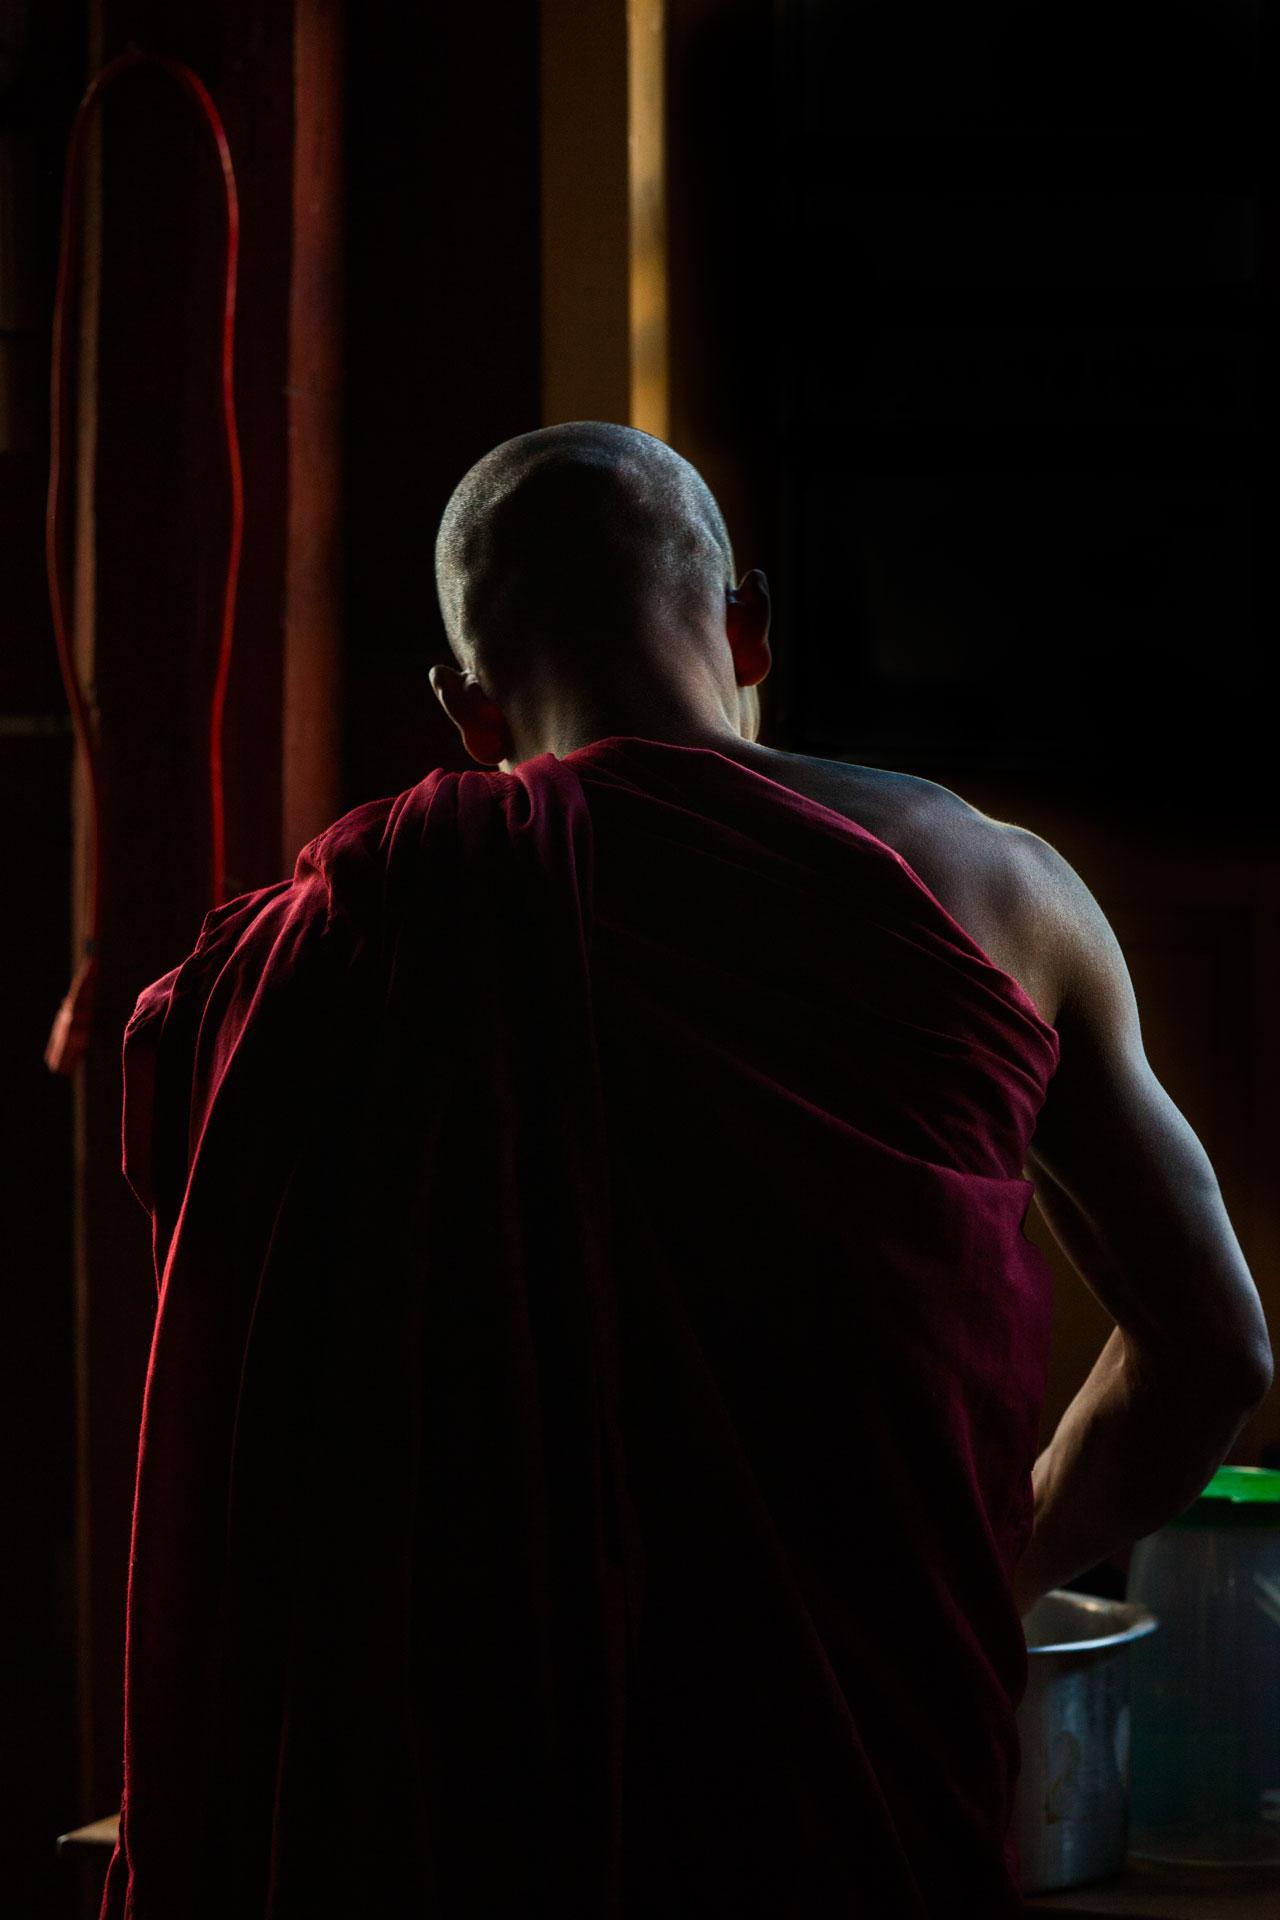 monje-budista-lavando-ropa-monasterio-bagan-myanmar.jpg